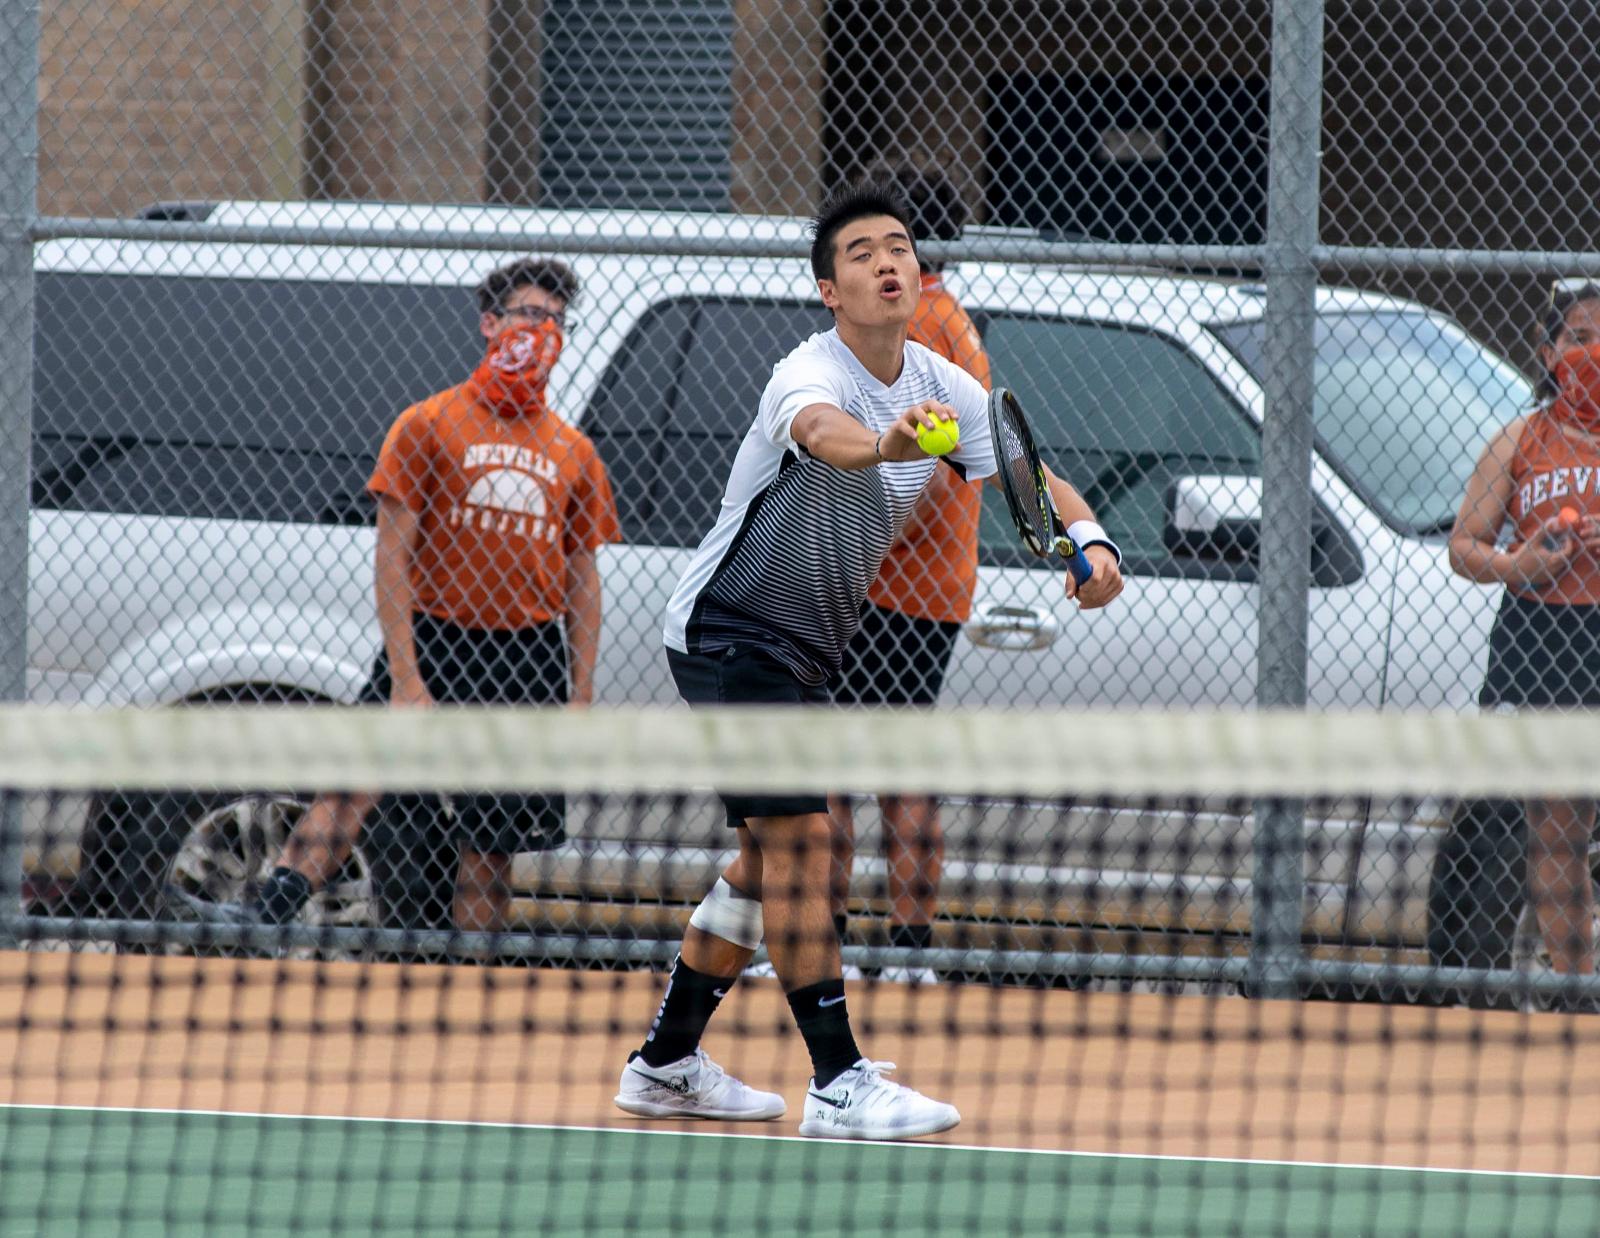 Tennis vs Beeville